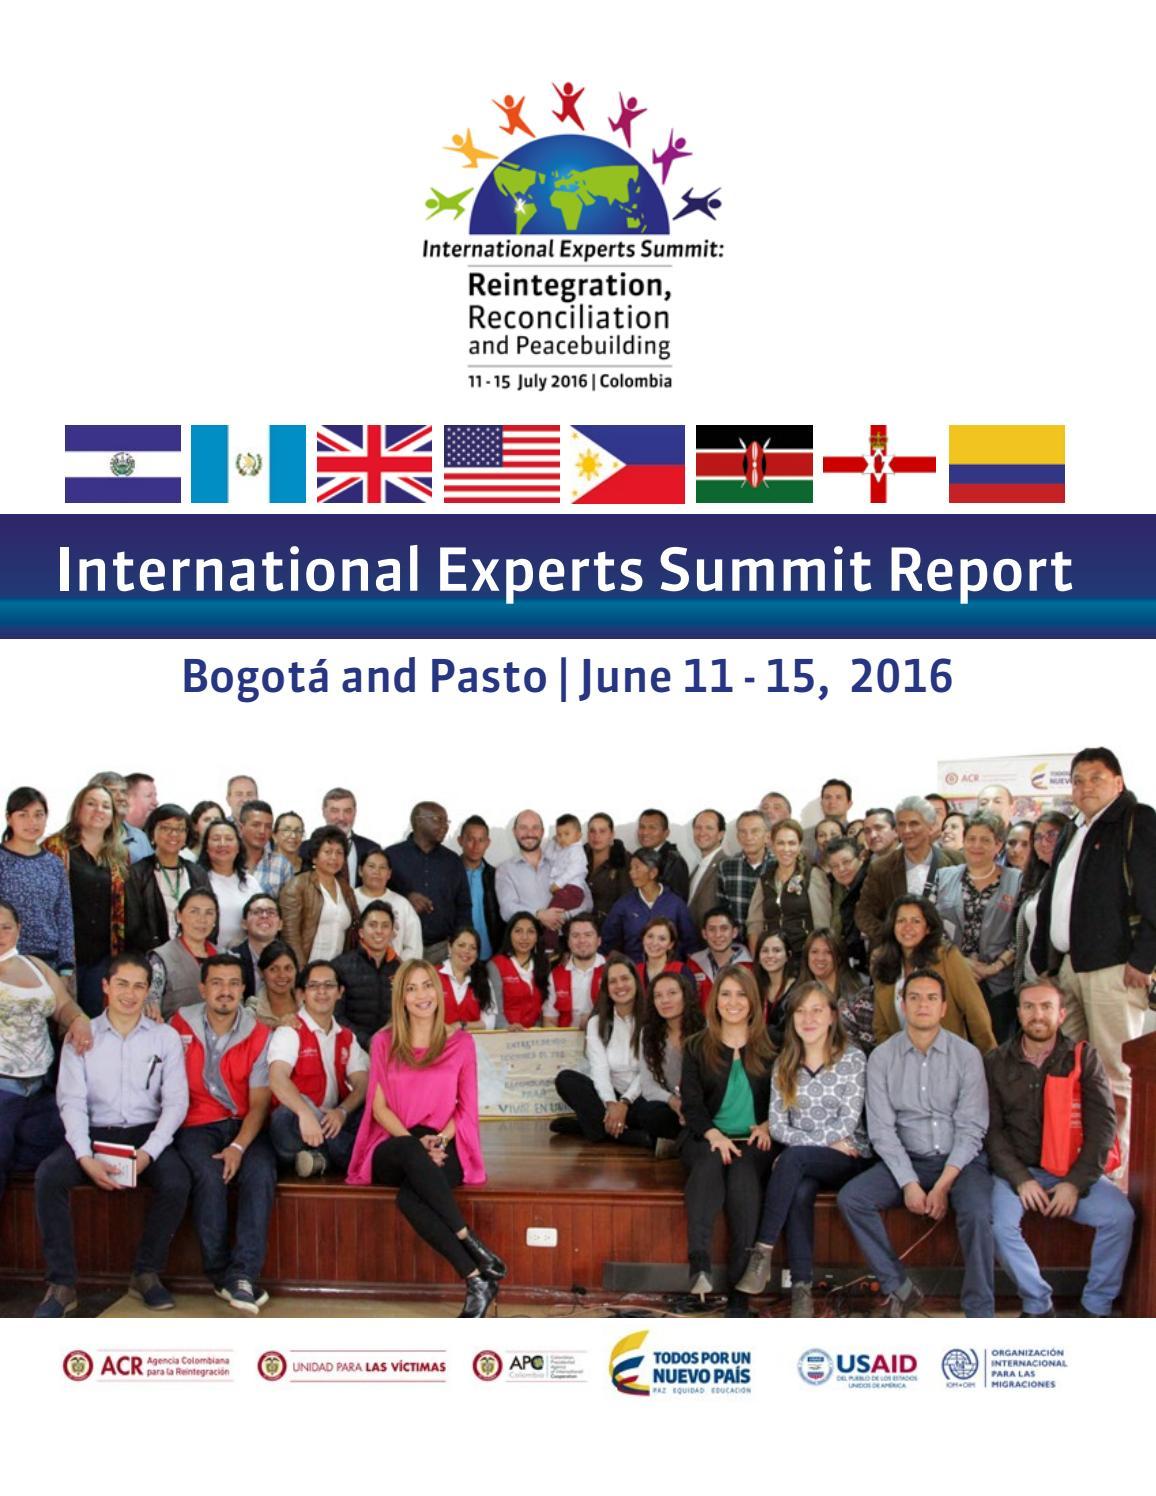 Aico Lombana international experts summit report 2016arn colombia - issuu